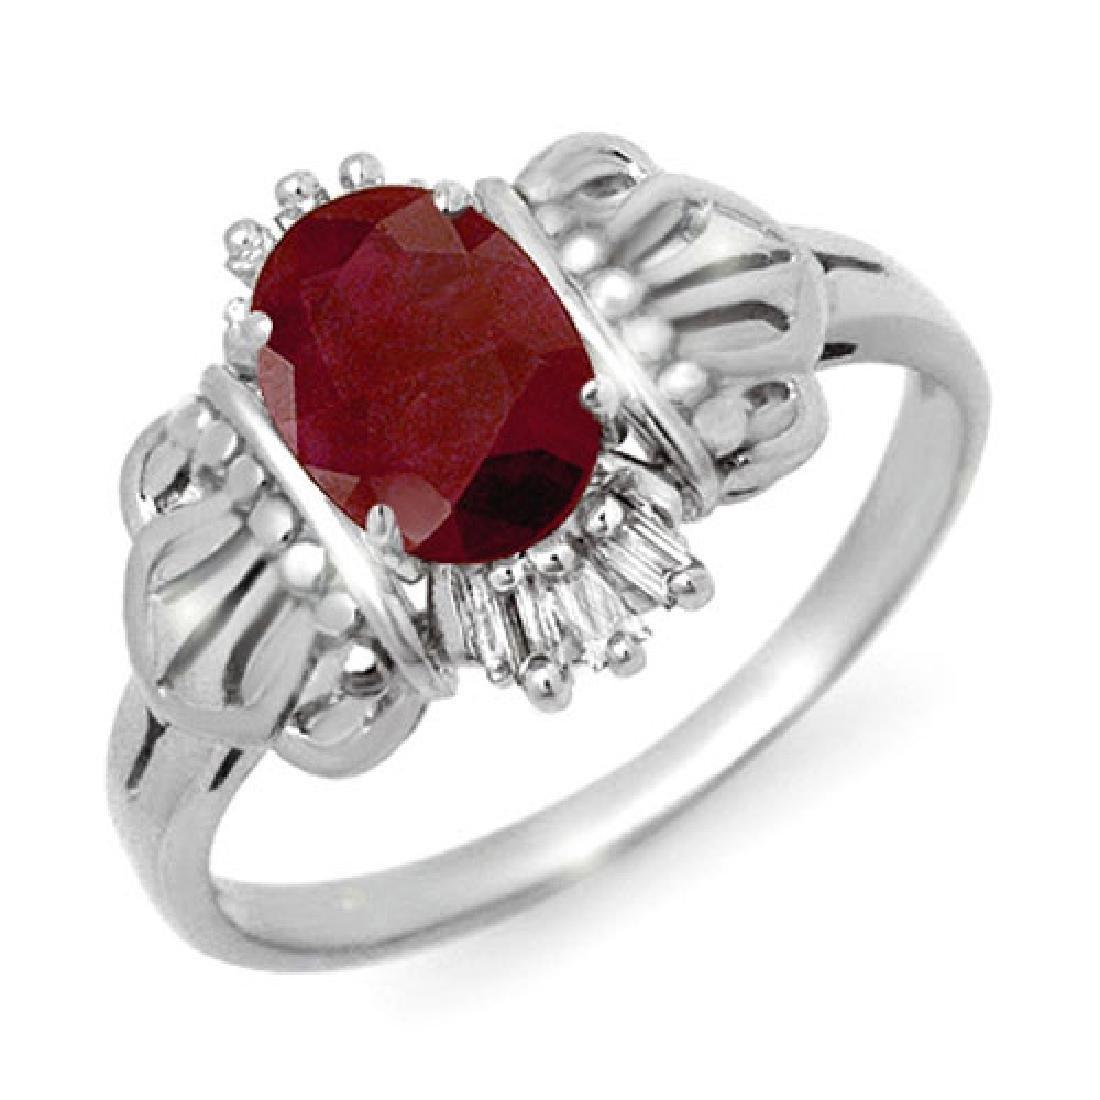 1.06 CTW Ruby & Diamond Ring 10K White Gold